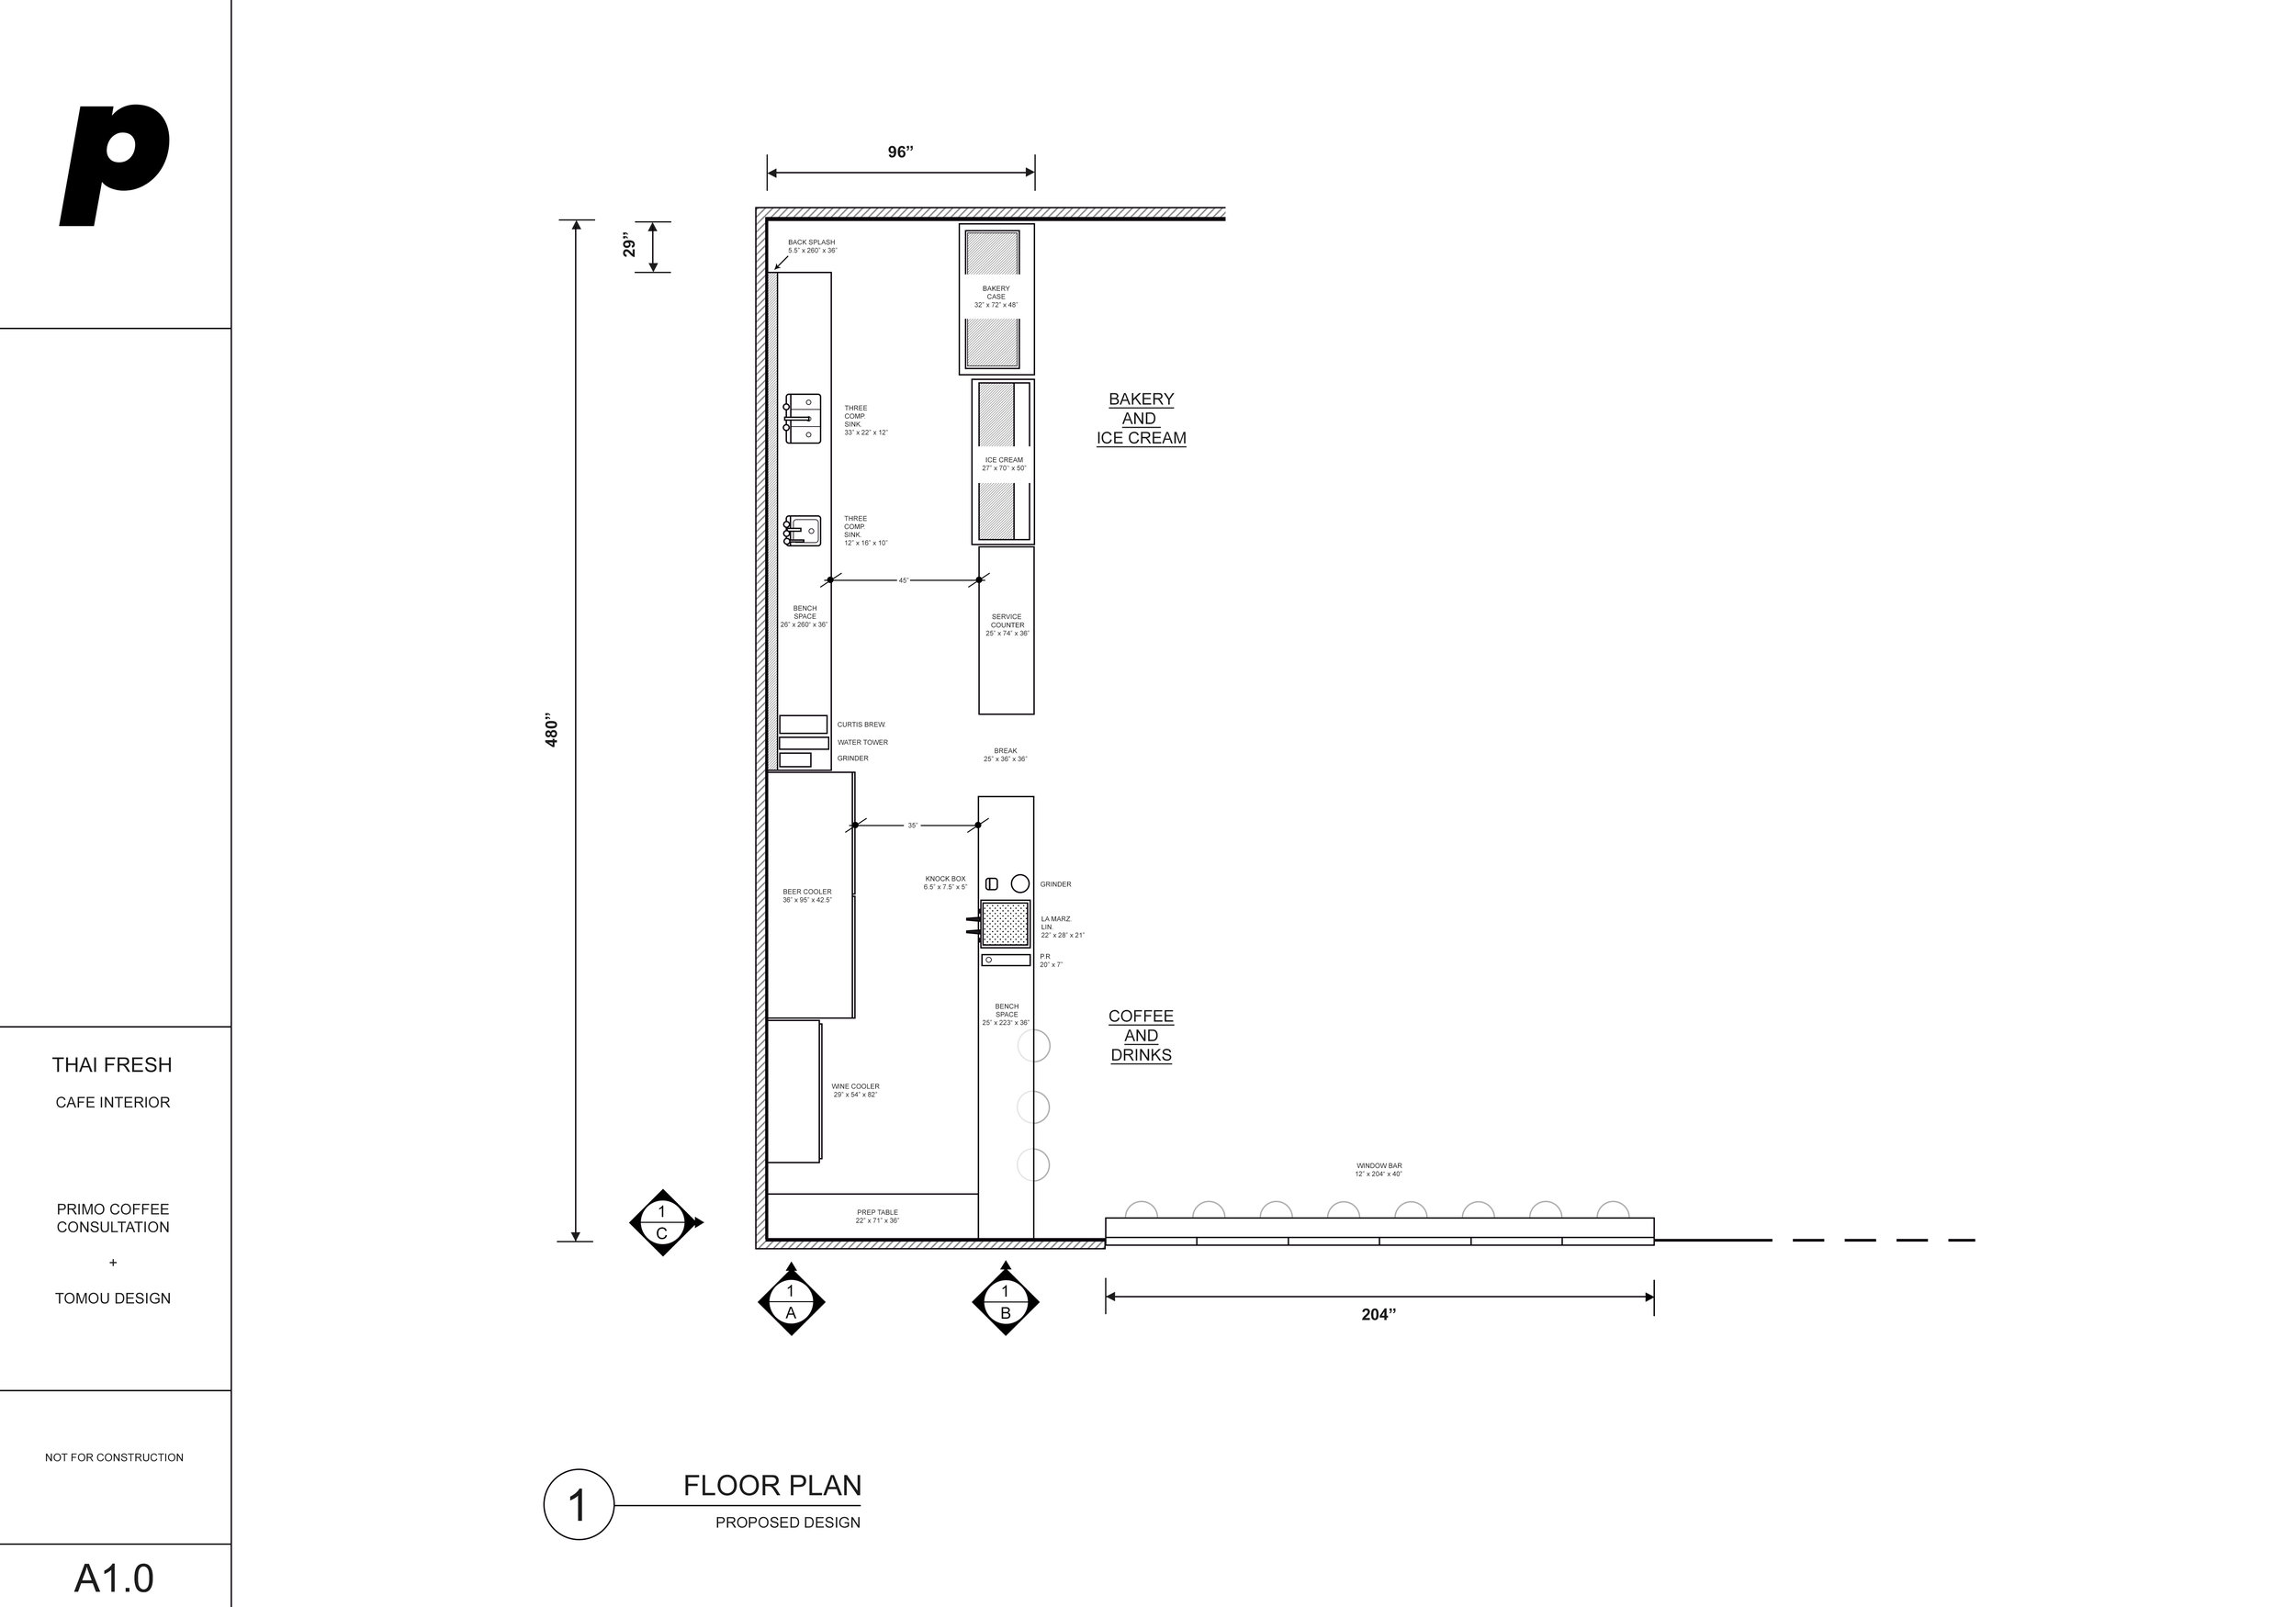 1.Thai Fresh Floor Plan.jpg